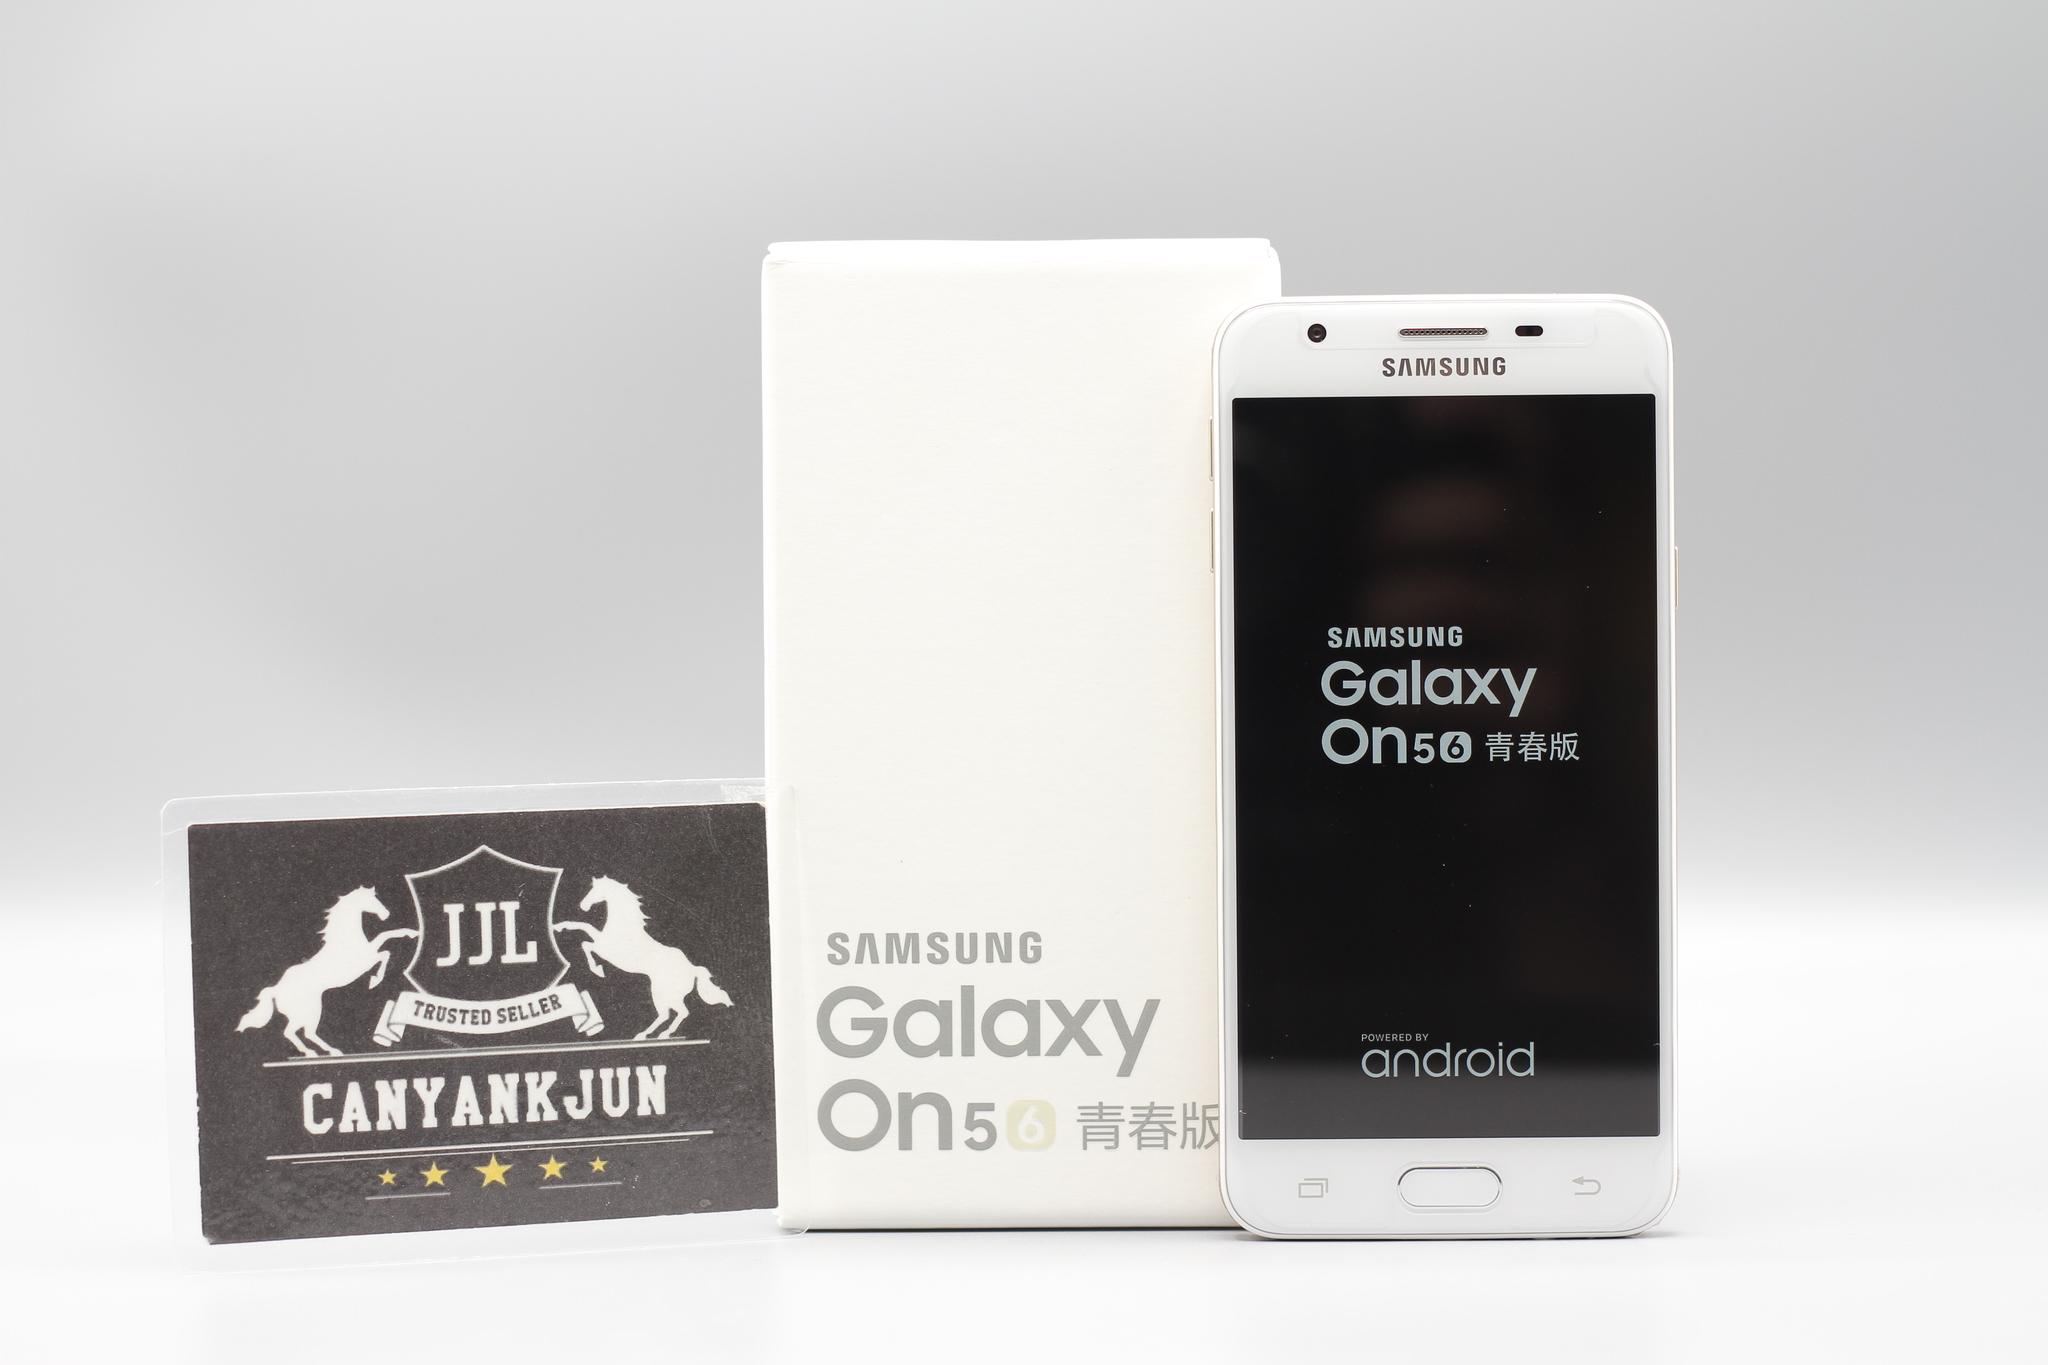 Jual Samsung Galaxy On5 On 5 G5510 4g 2gb 16gb Gold Garansi Distri Ram 1 Thn Canyankjun Tokopedia